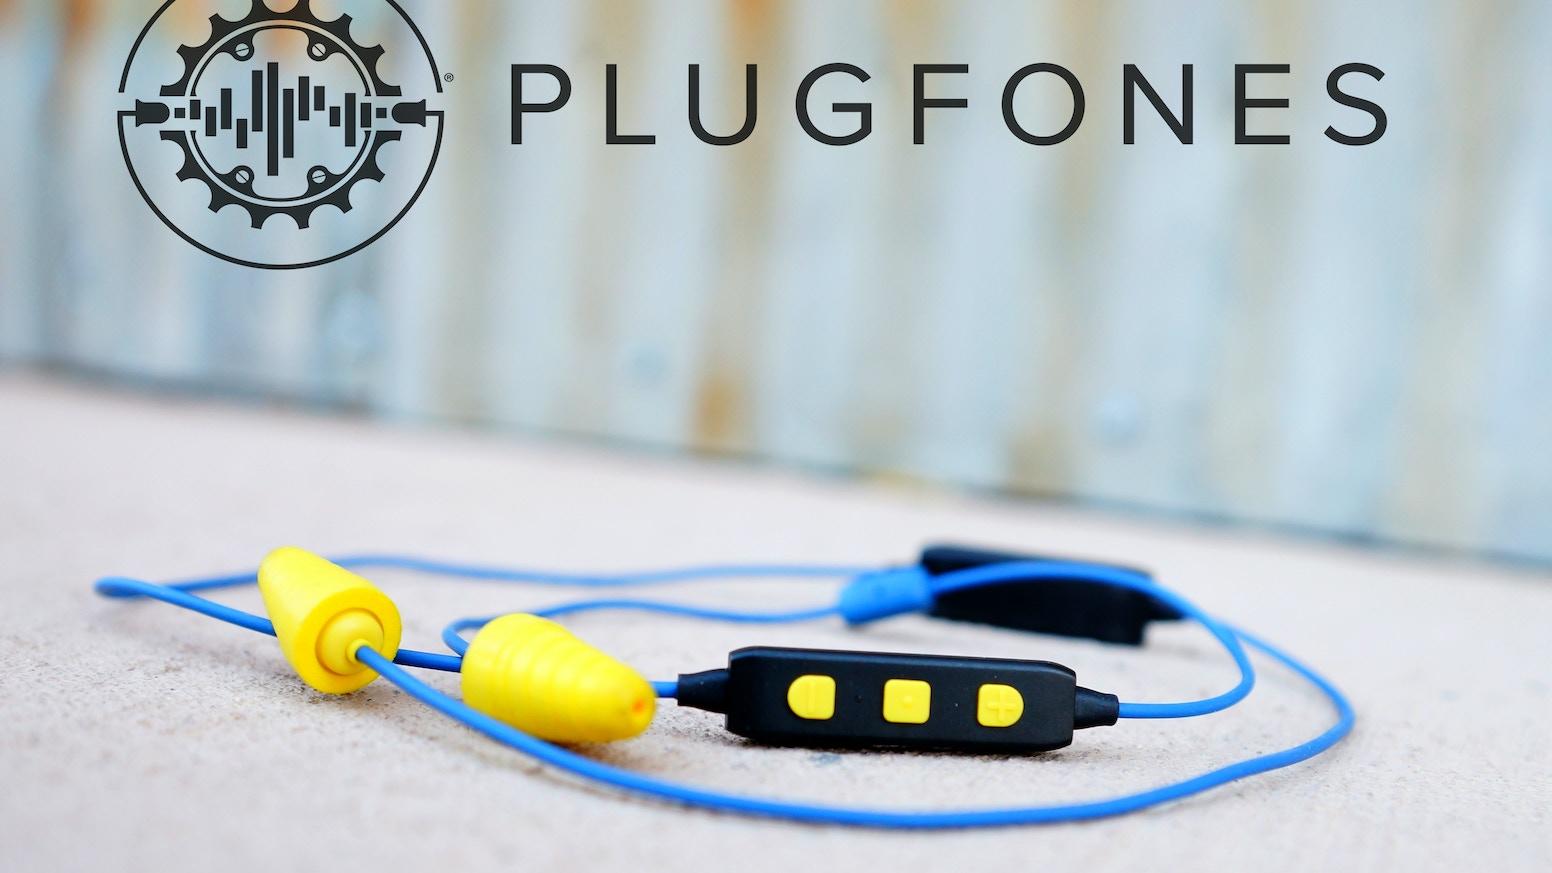 Where Earplugs Meet Earbuds! PLUGFONES® LIBERATE 2.0 by ...